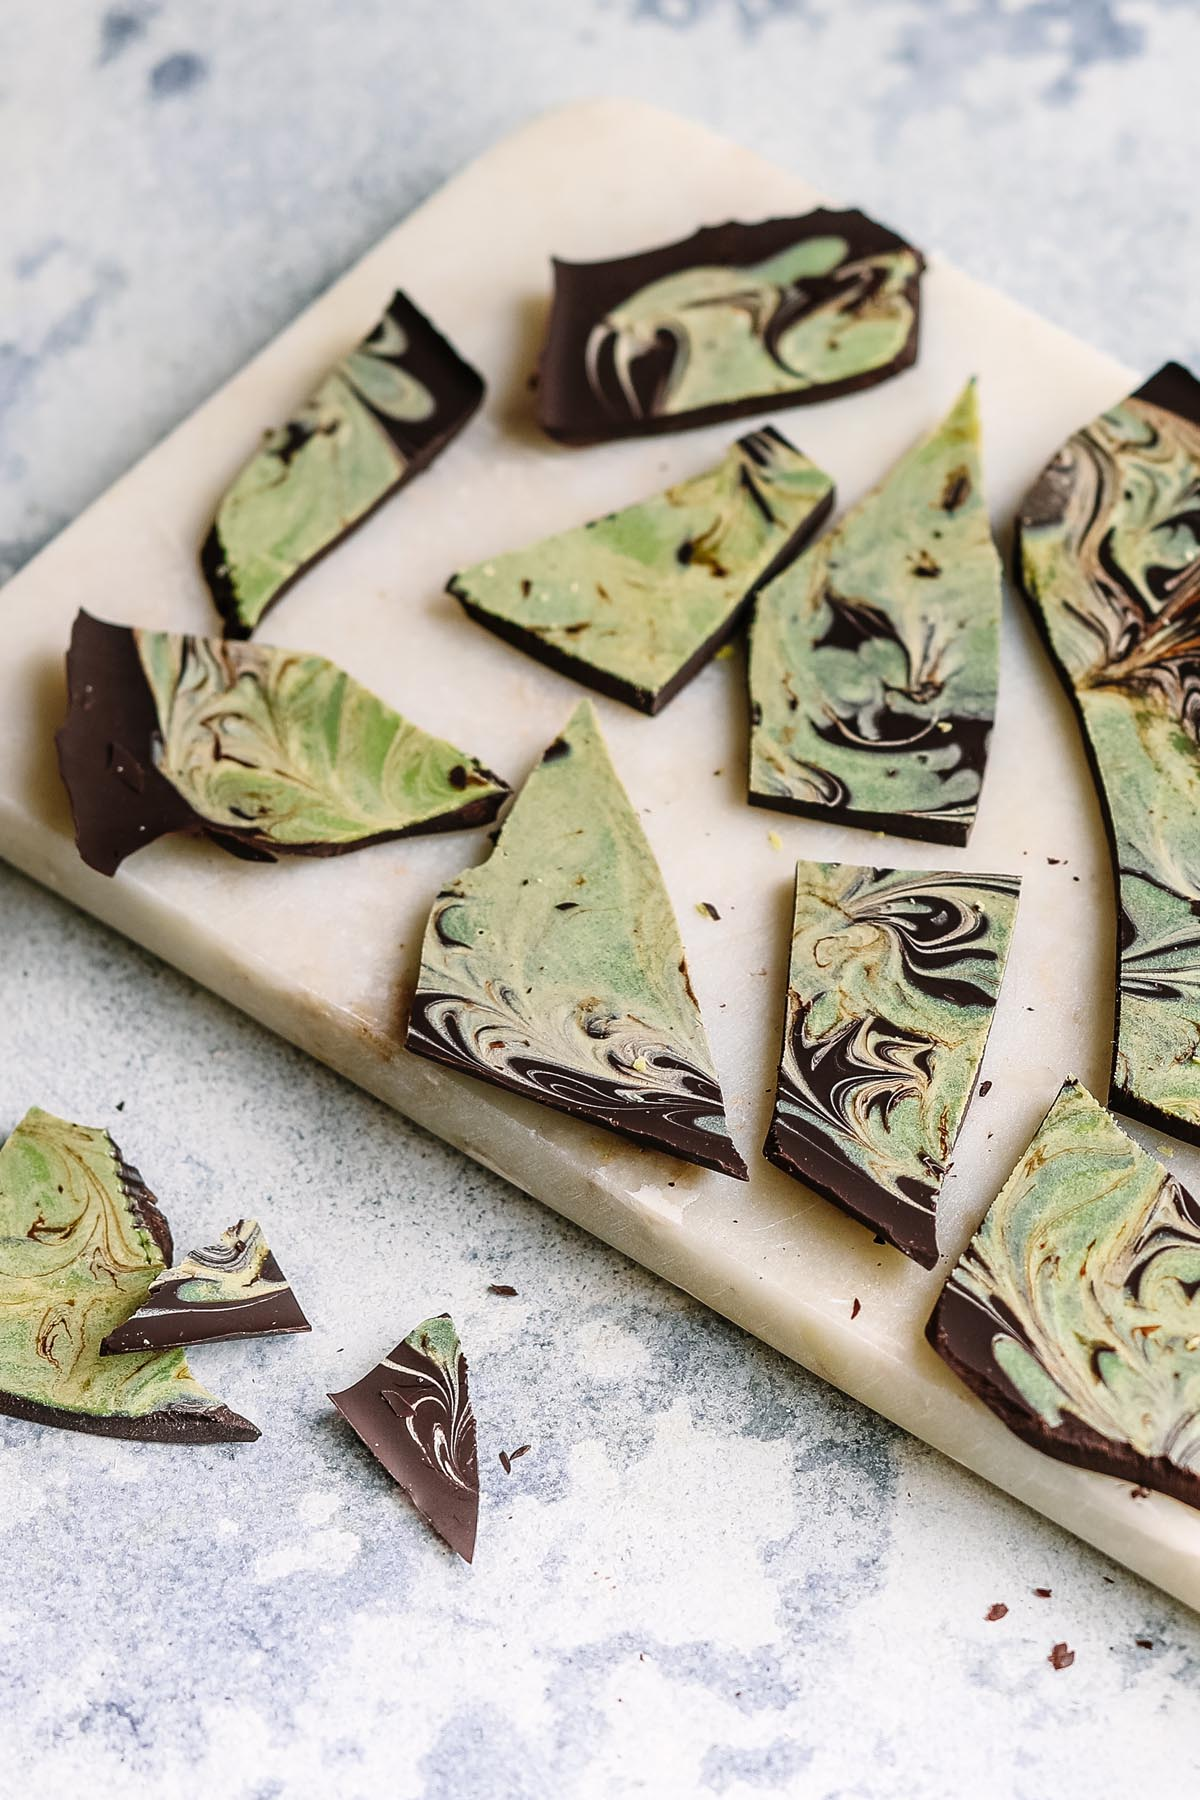 Matcha Swirl Chocolate - You Totally Got This - Sugar Free Desserts